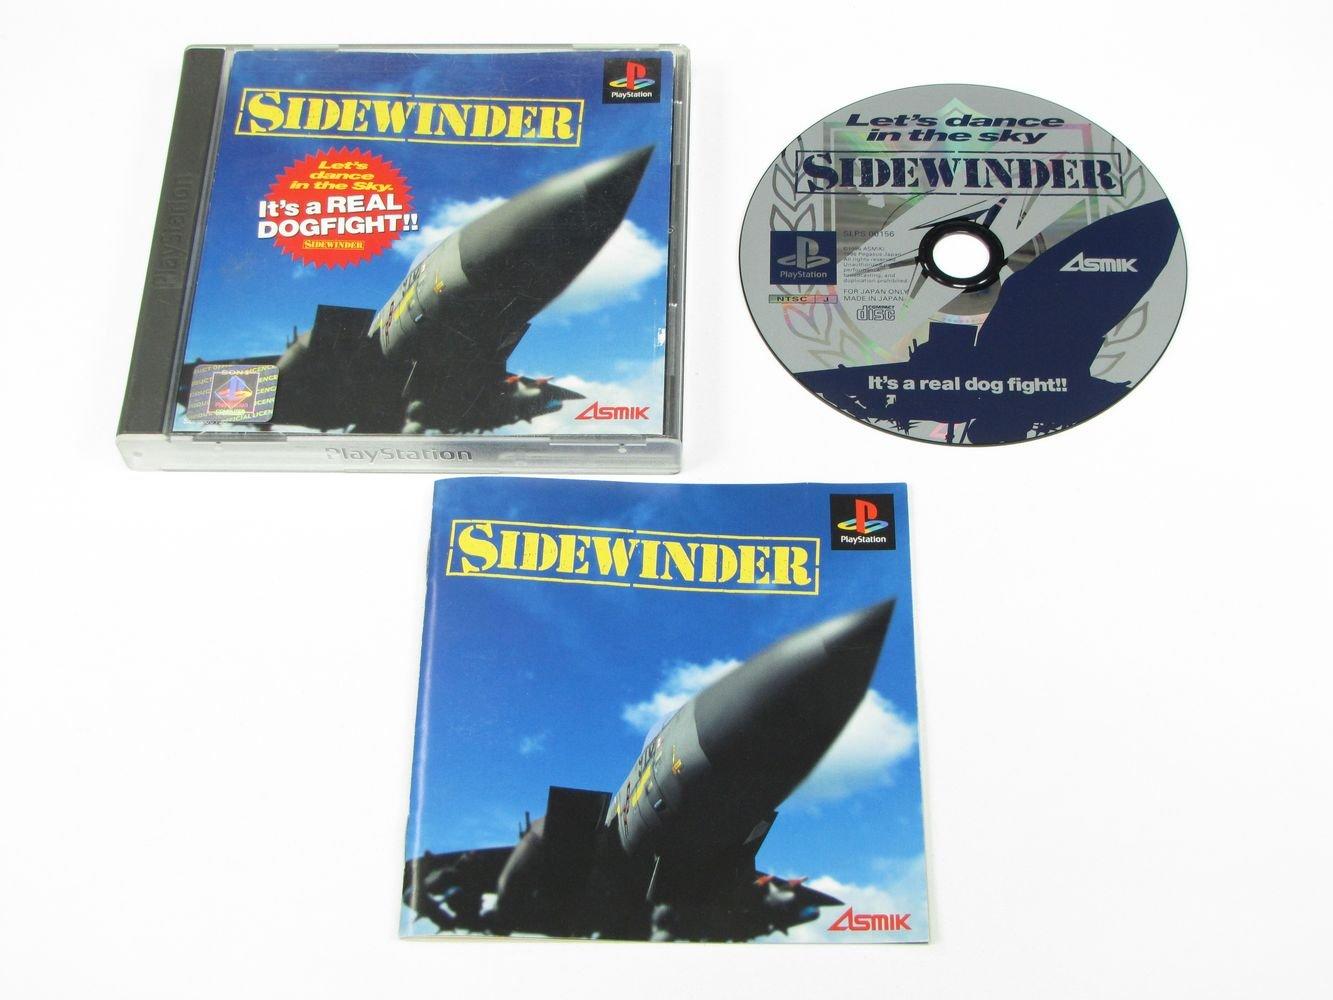 Sidewinder [Japanese Import Video Game]